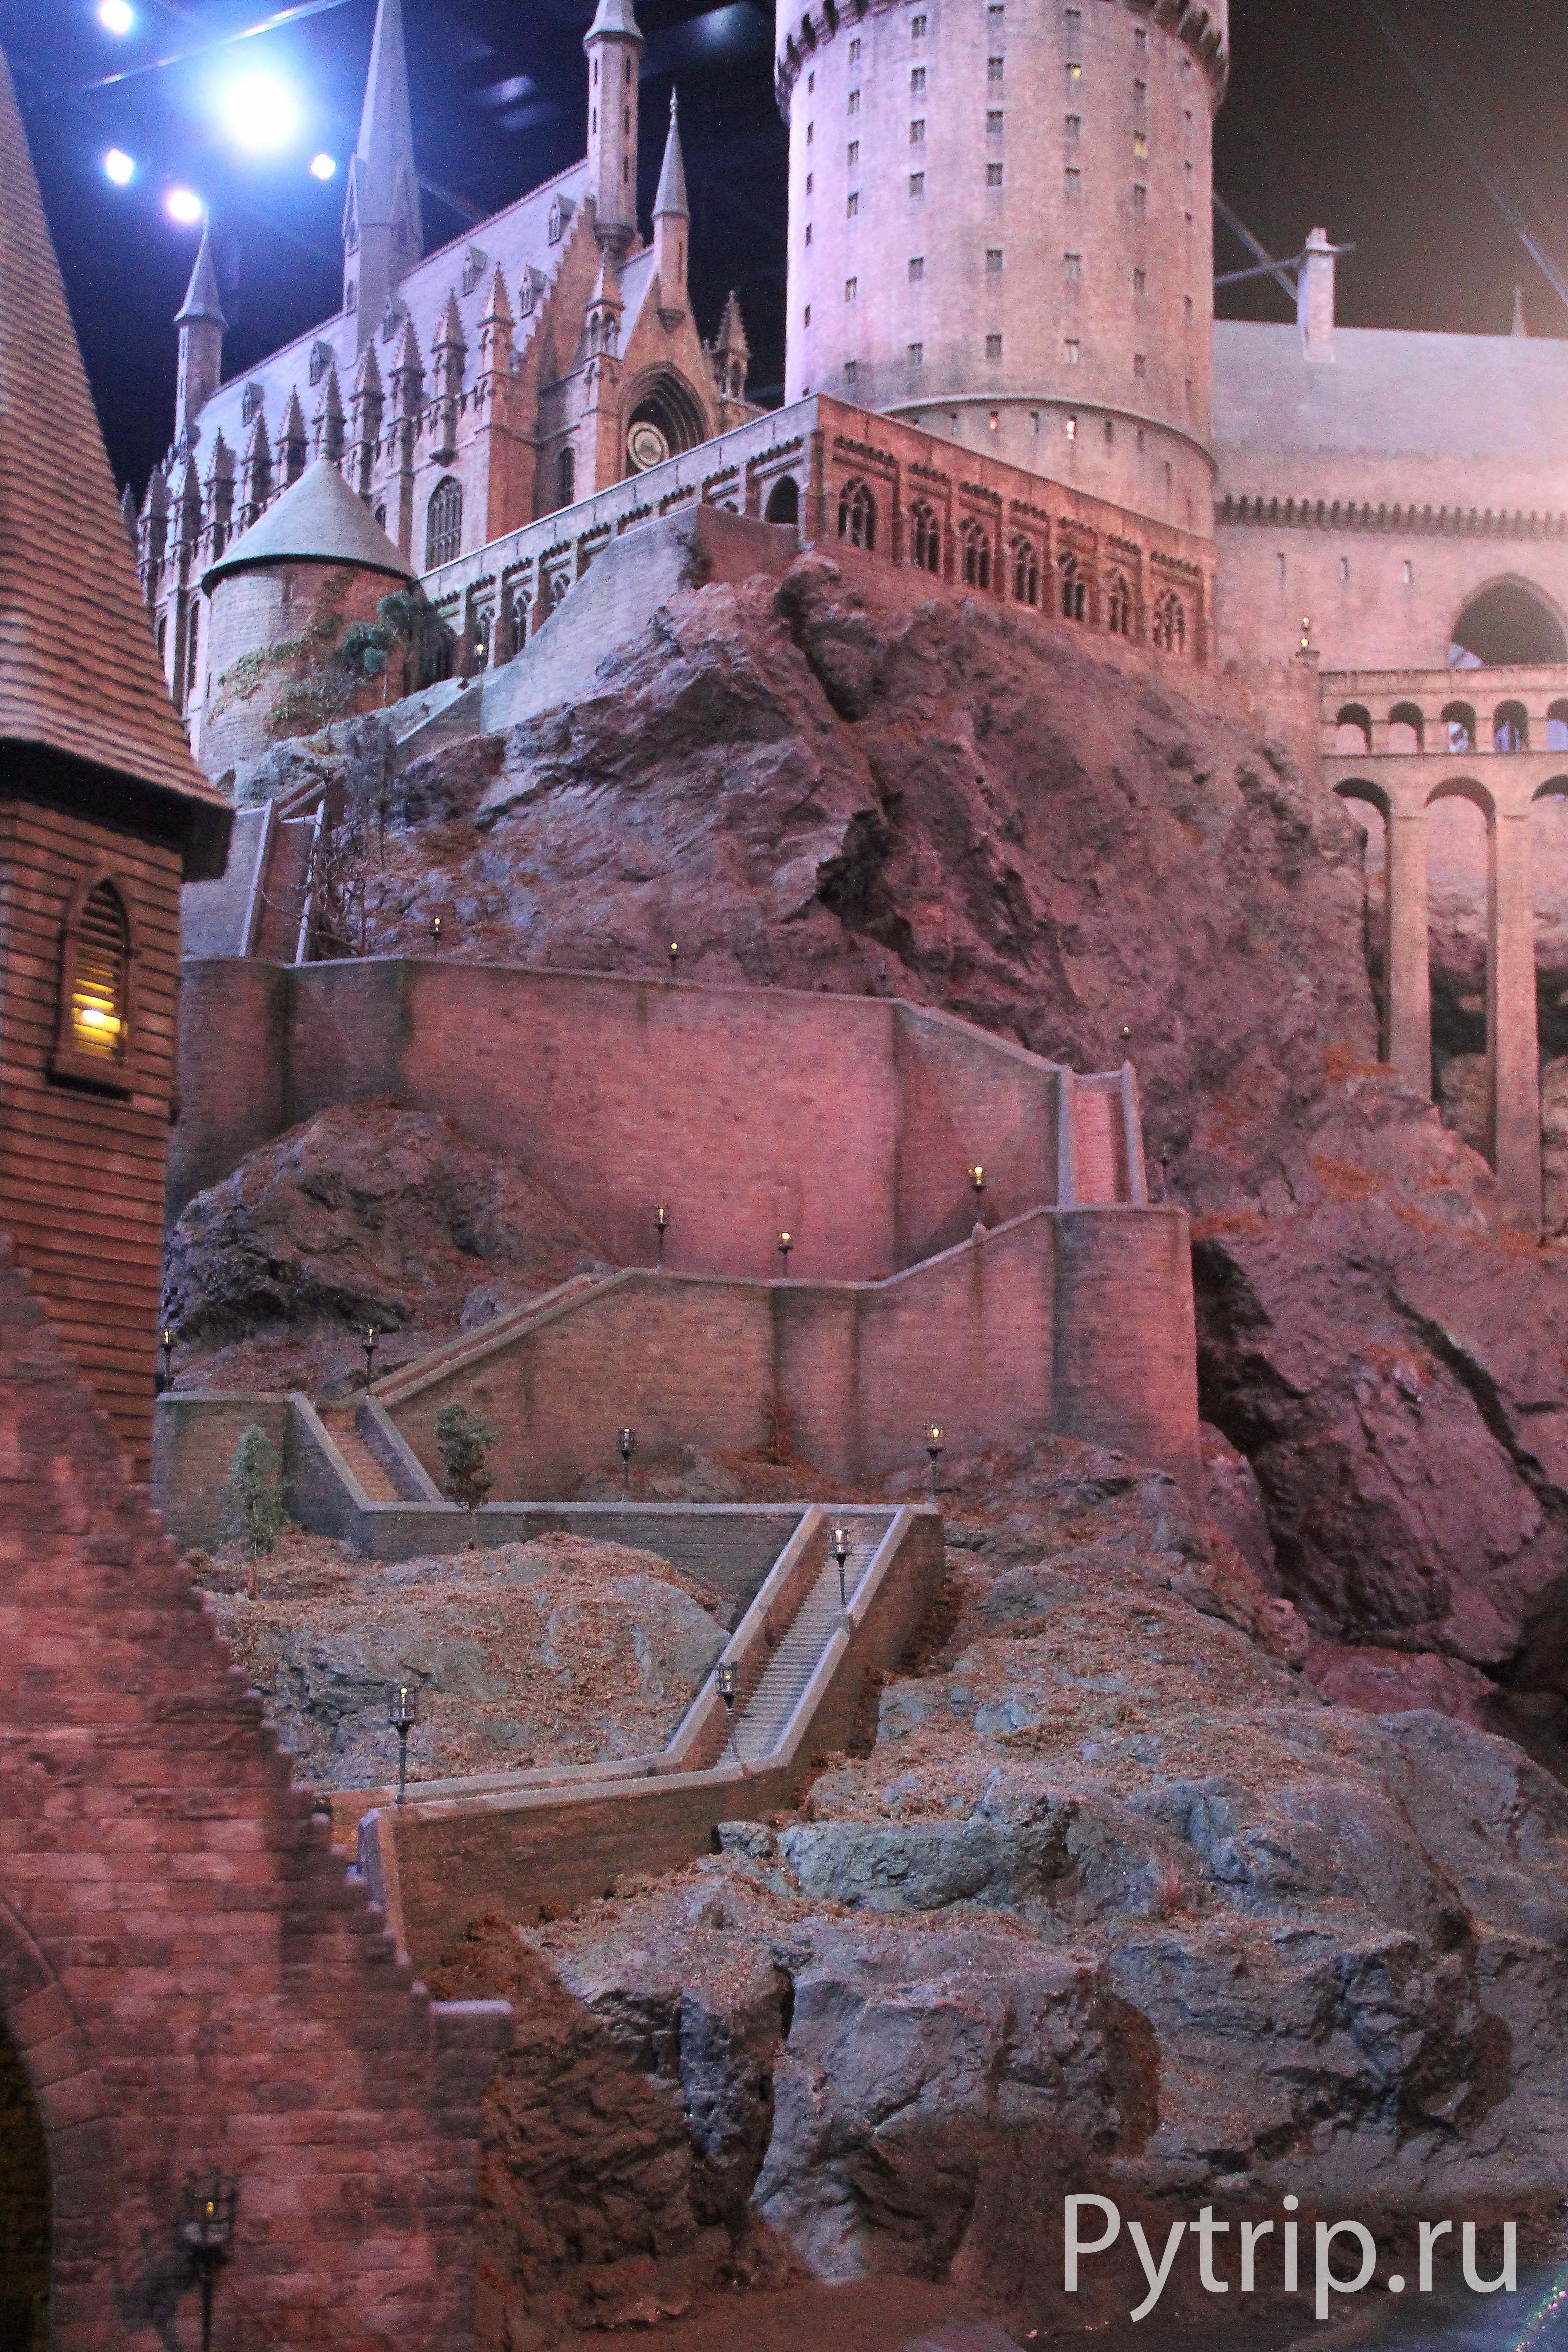 Замок Хогвартс в музее Гарри Поттера